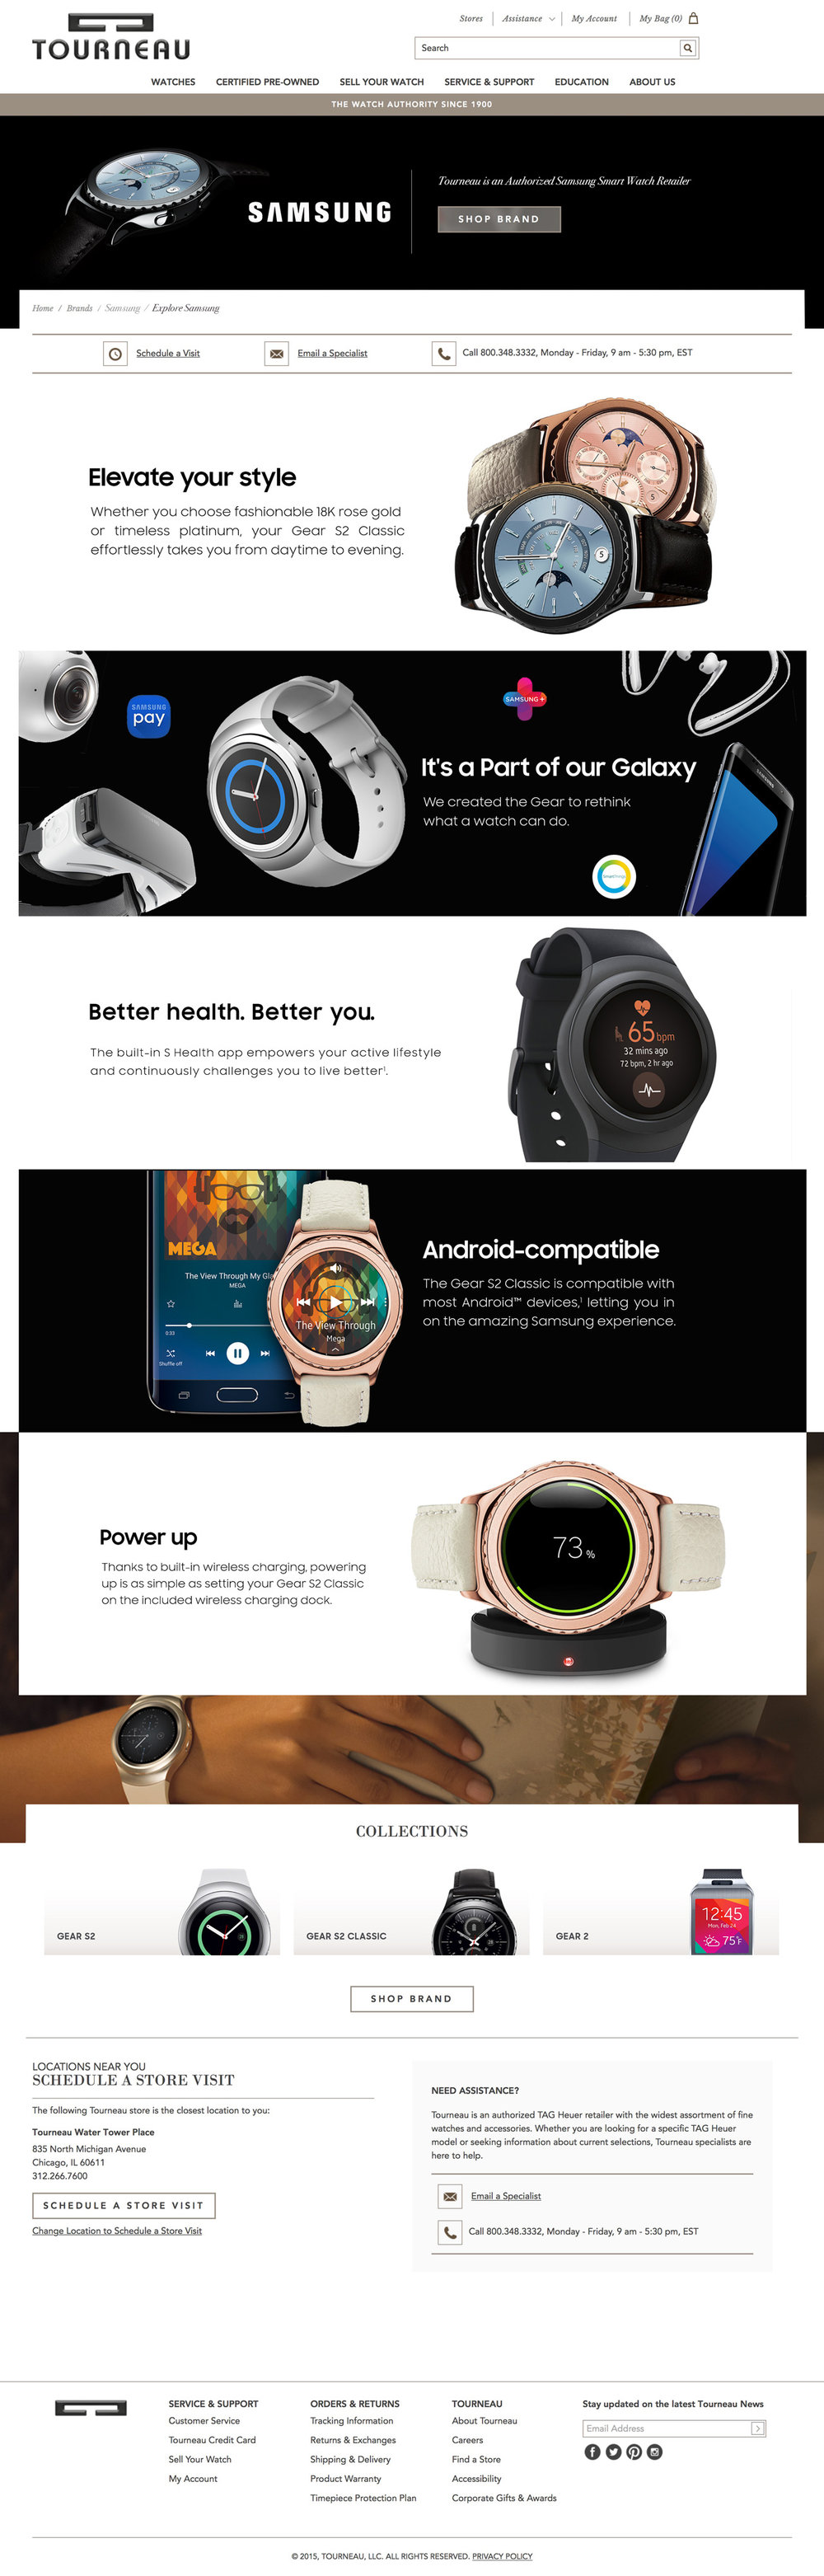 Samsung-tourneau-brand-explore.jpg